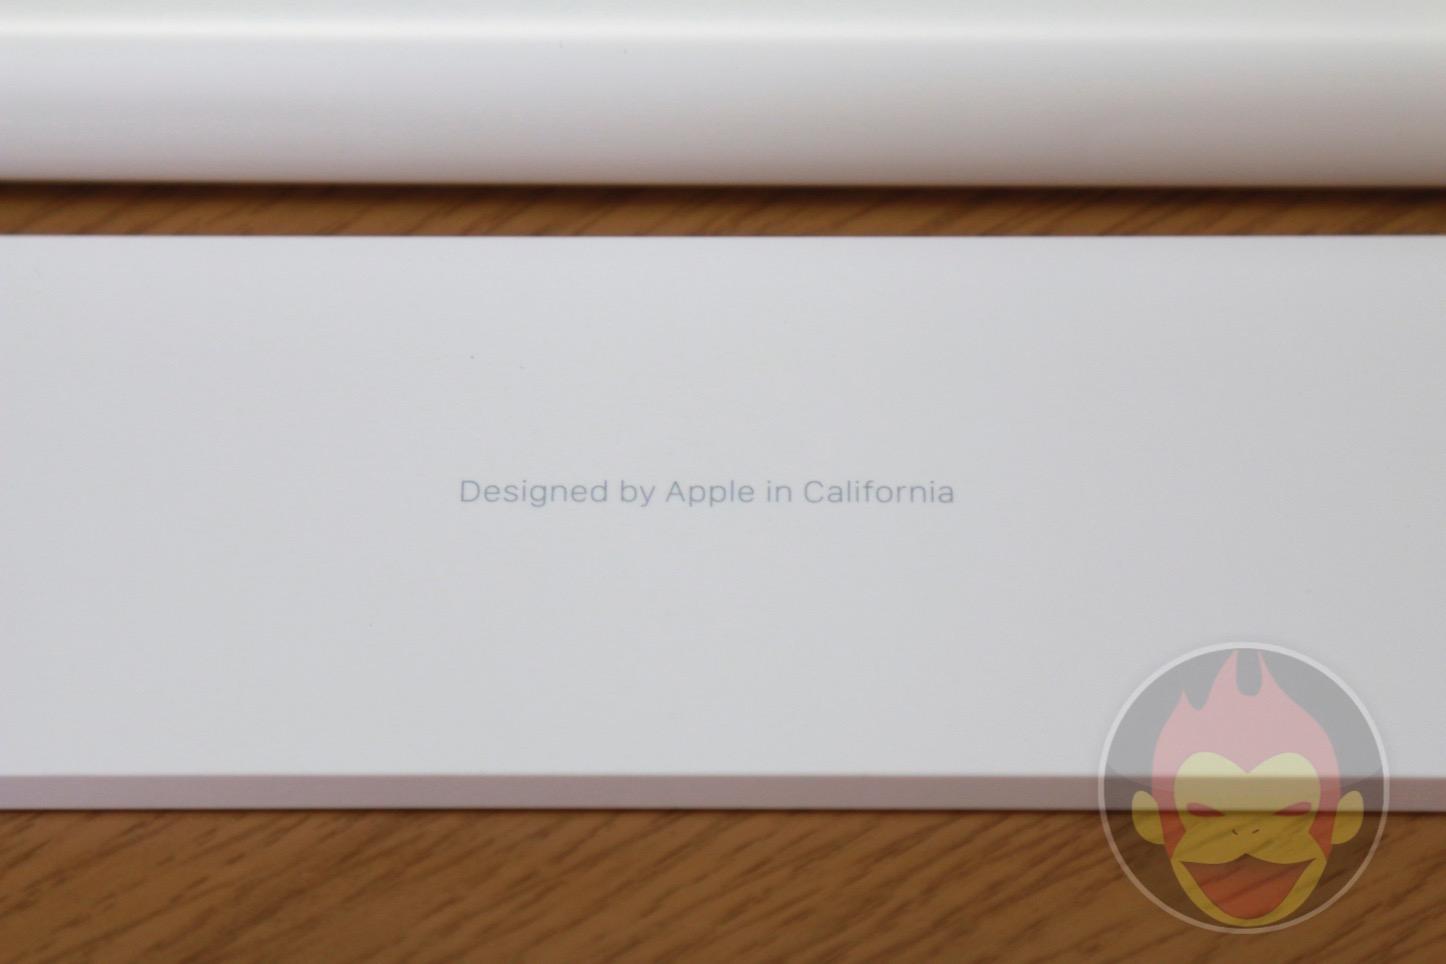 Apple-Watch-Sport-Review-06.jpg